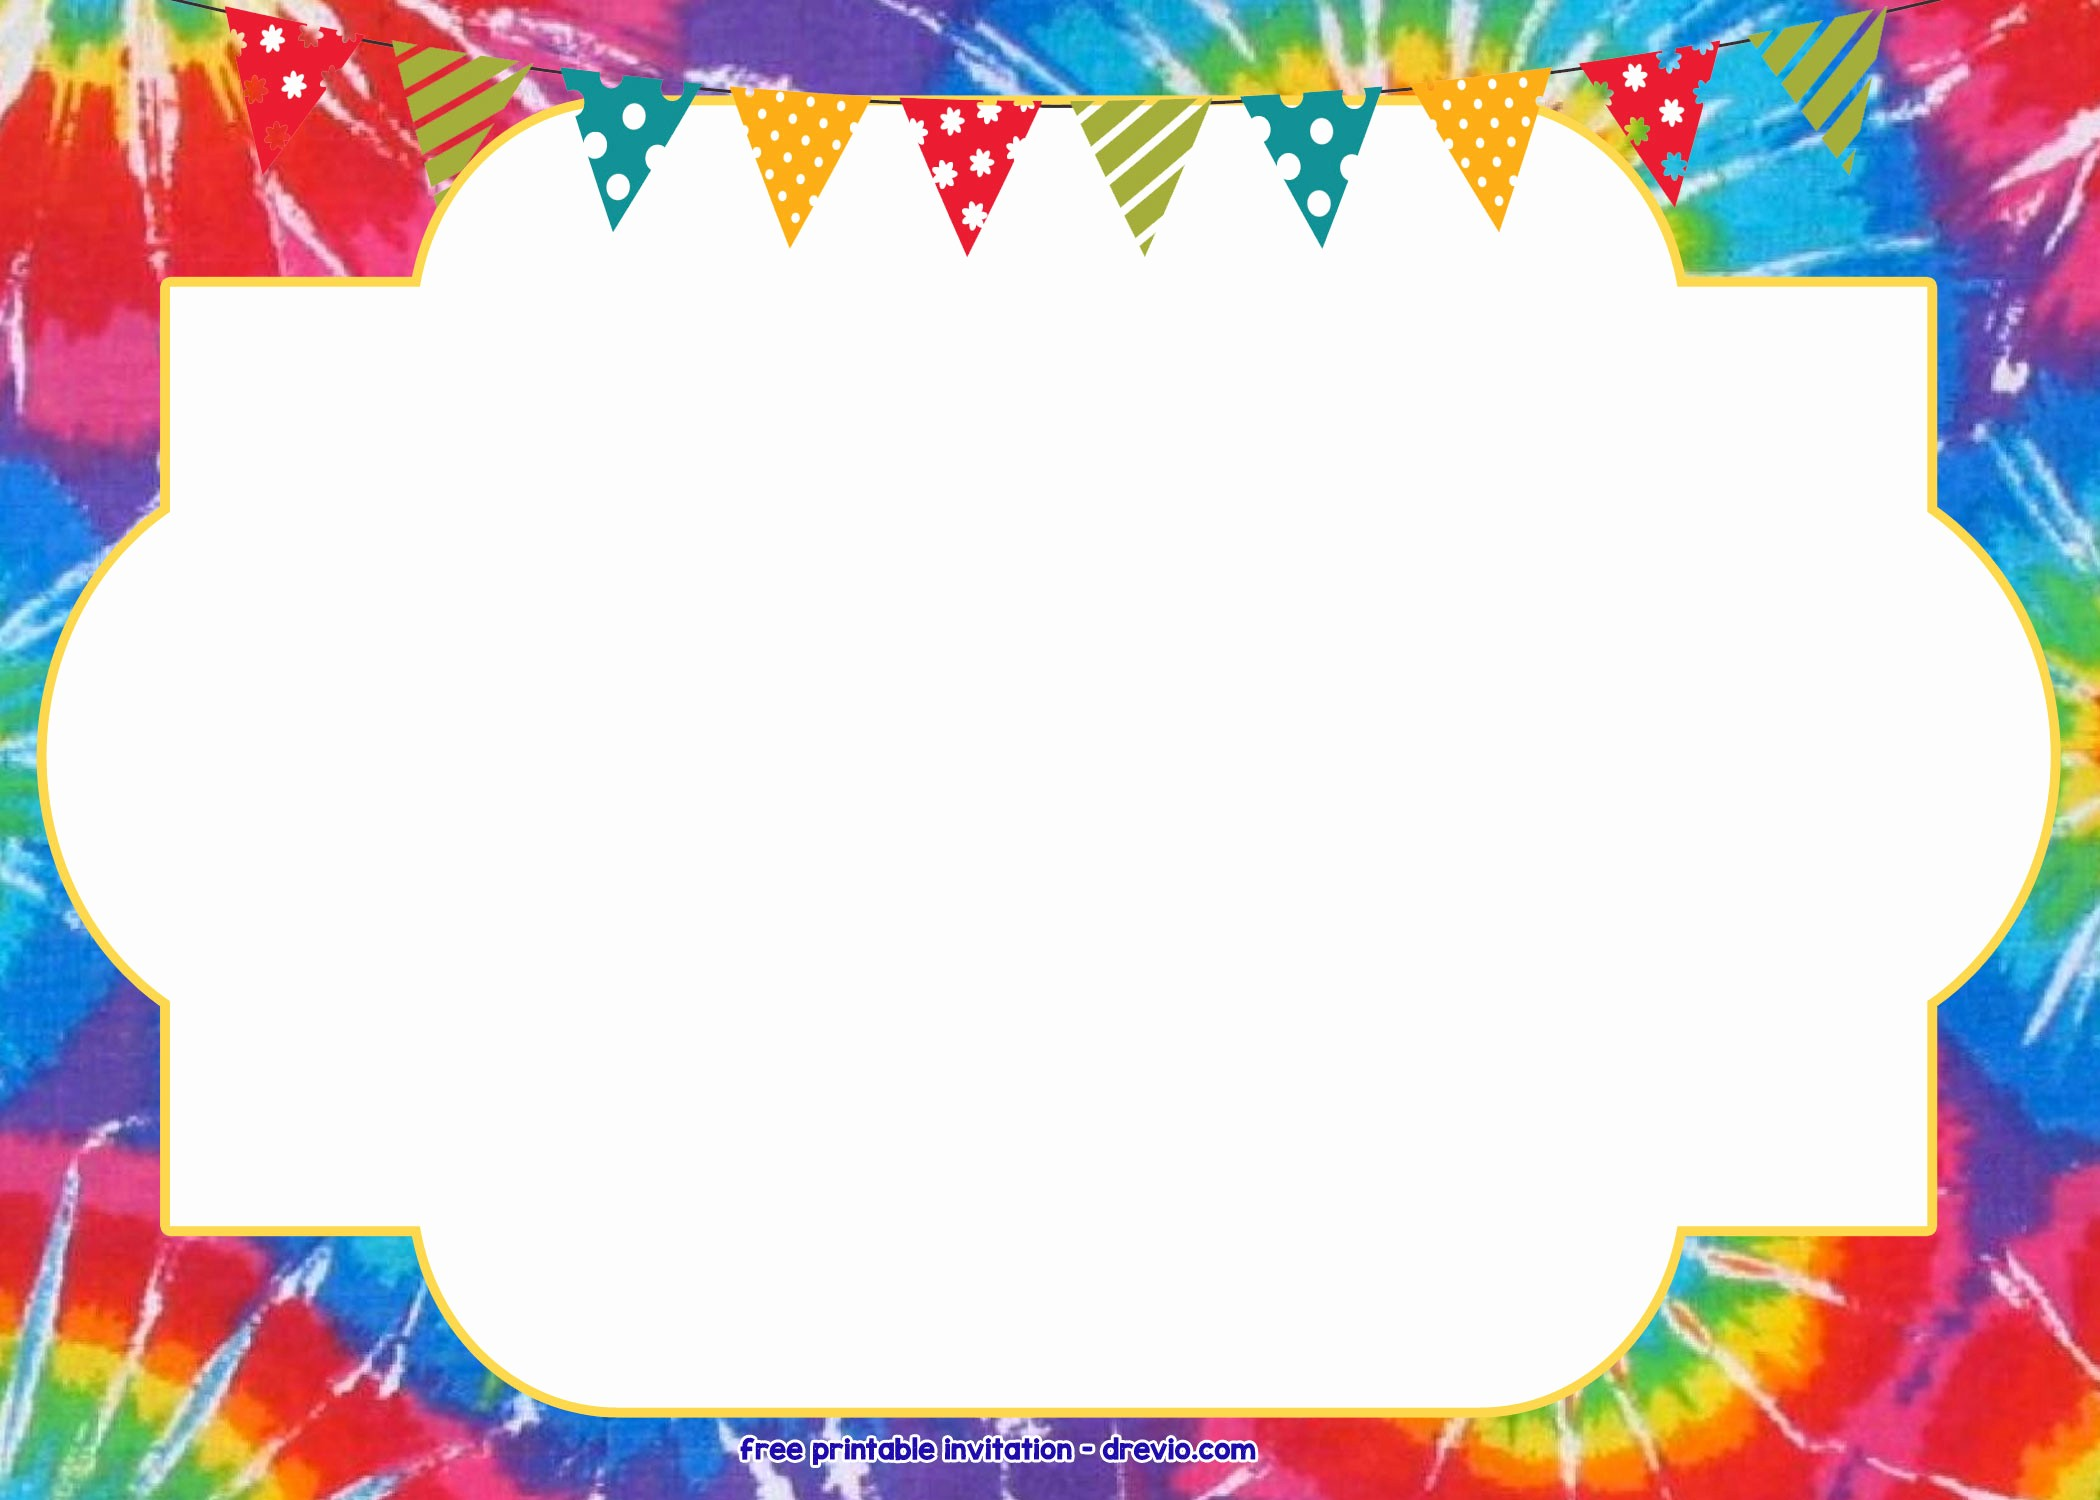 Tie Dye Party Invitations Printable Inspirational Free Tie Dye Invitation Template